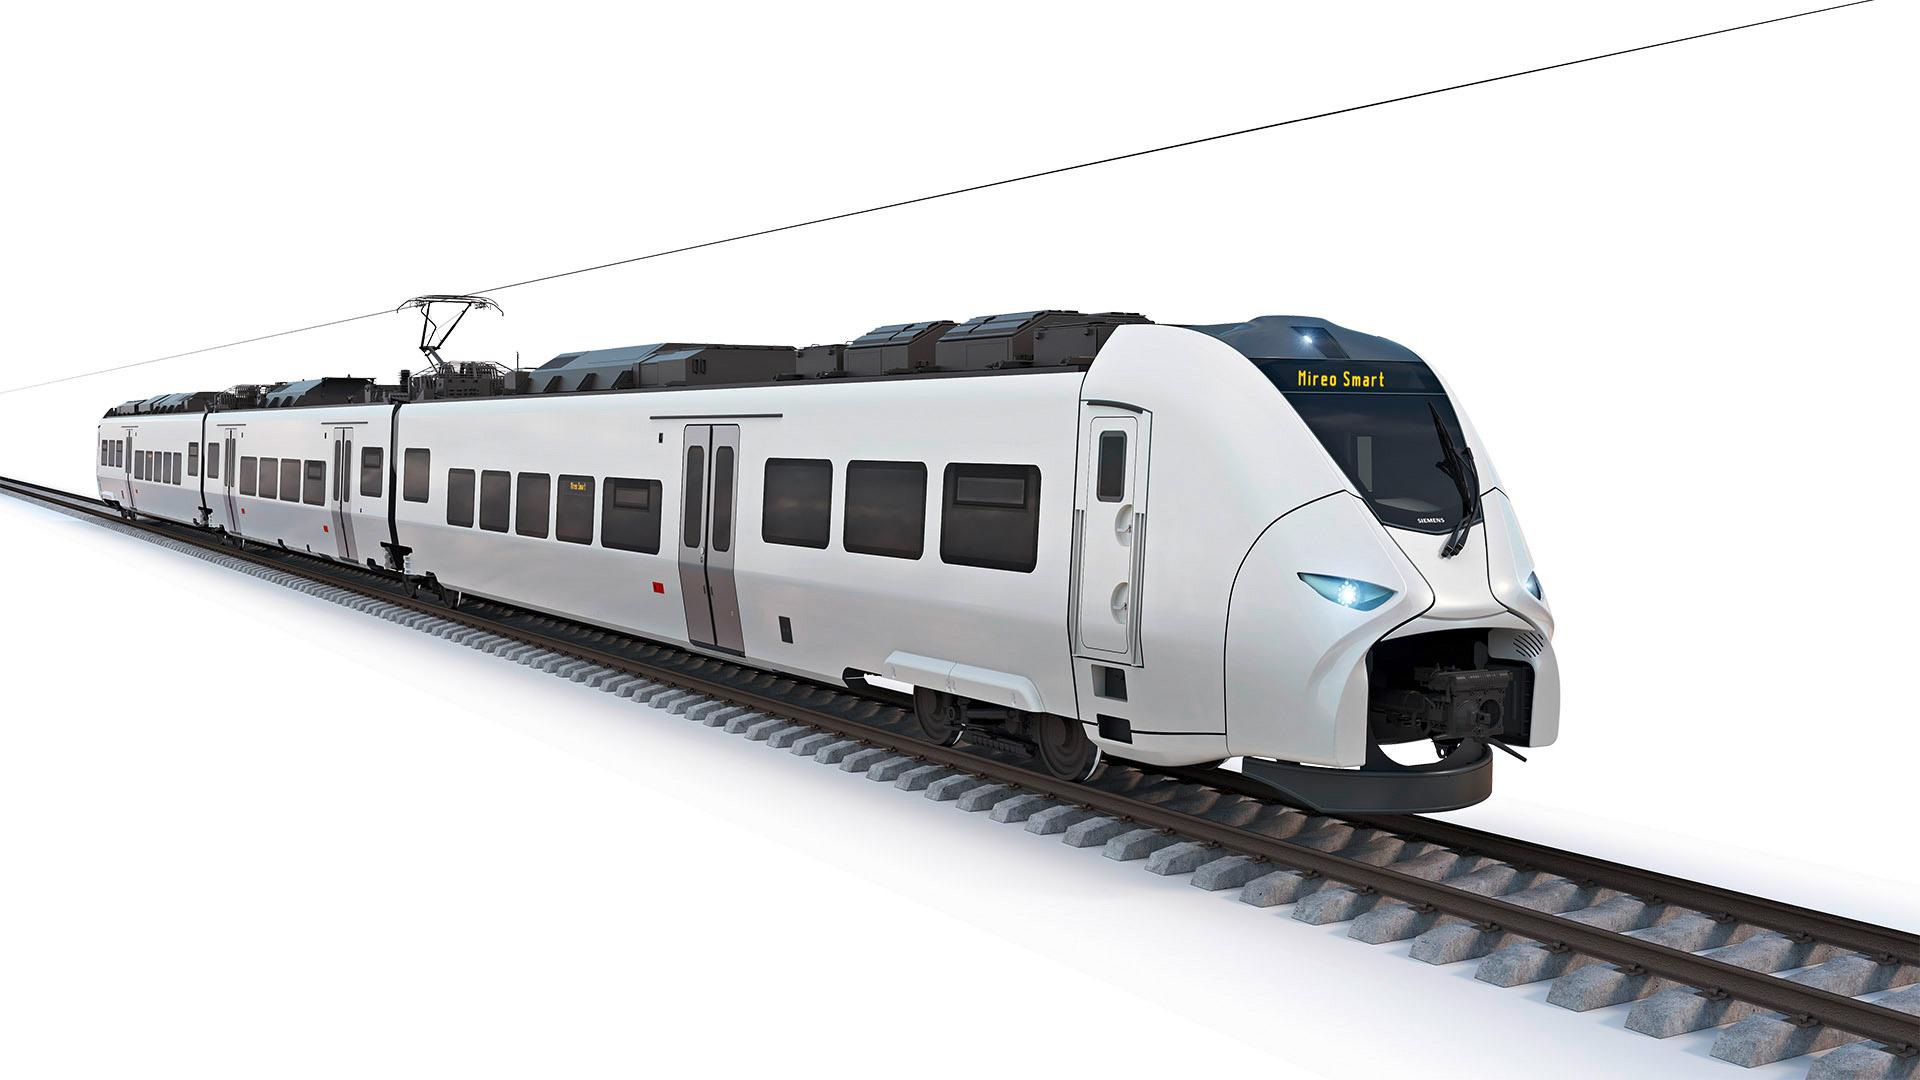 Siemens Mobility Mireo Smart rendering